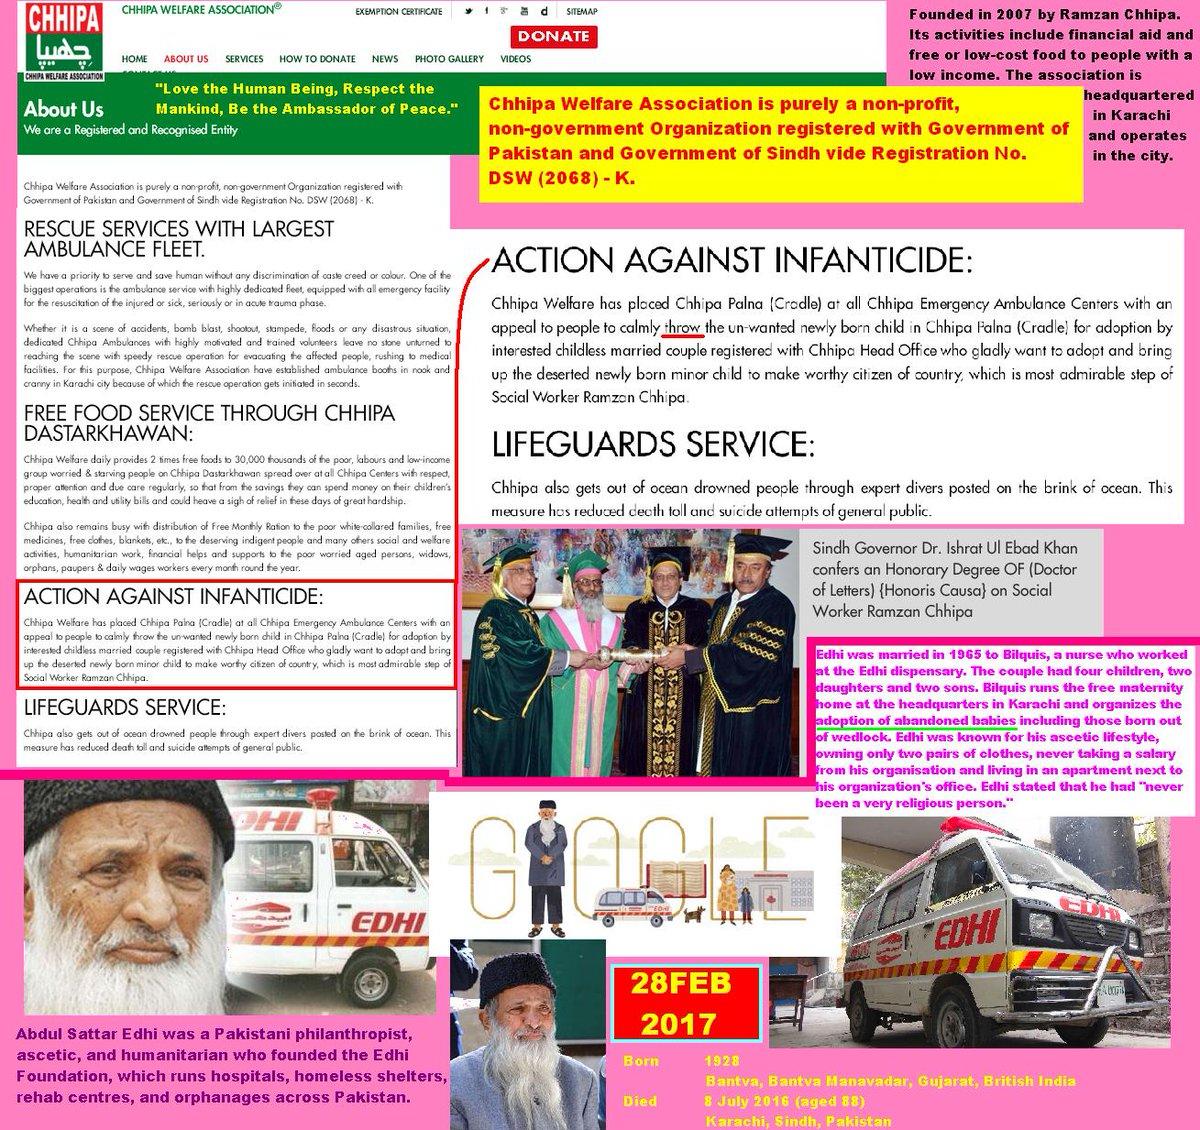 #google Celebrates Abdul Sattar Edhi Today